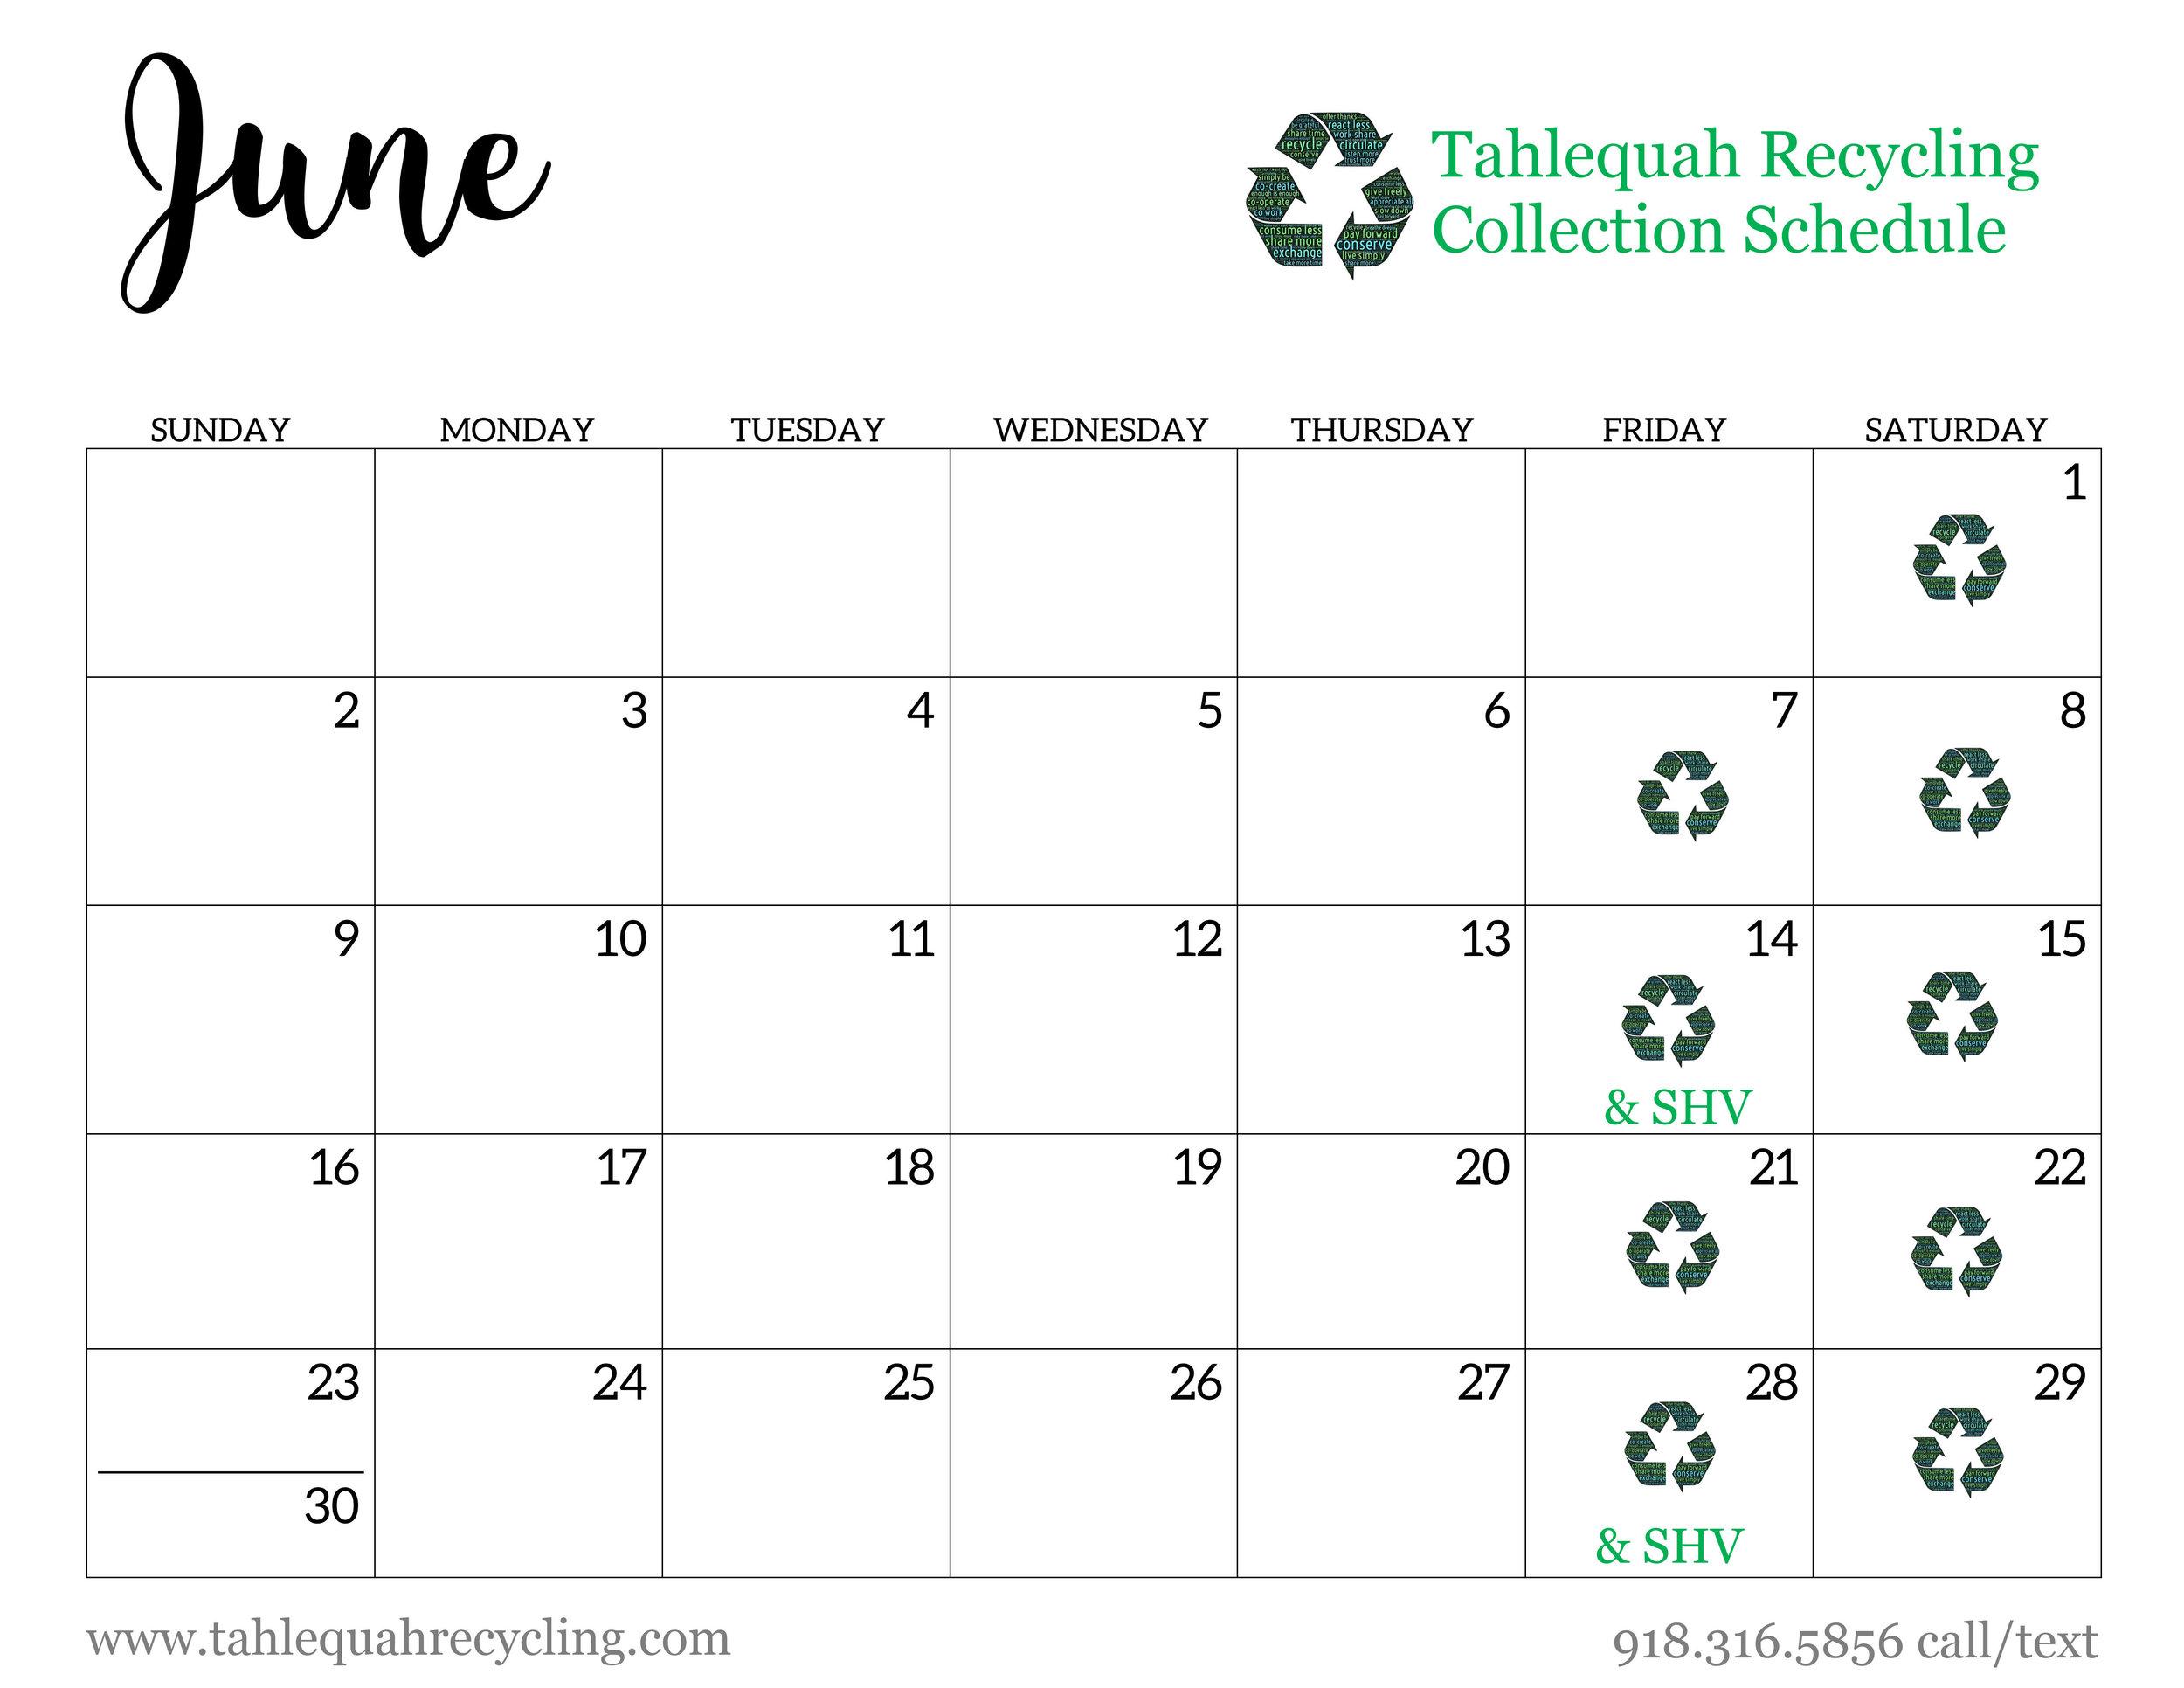 TahlequahRecyclingINC.June2019.jpg